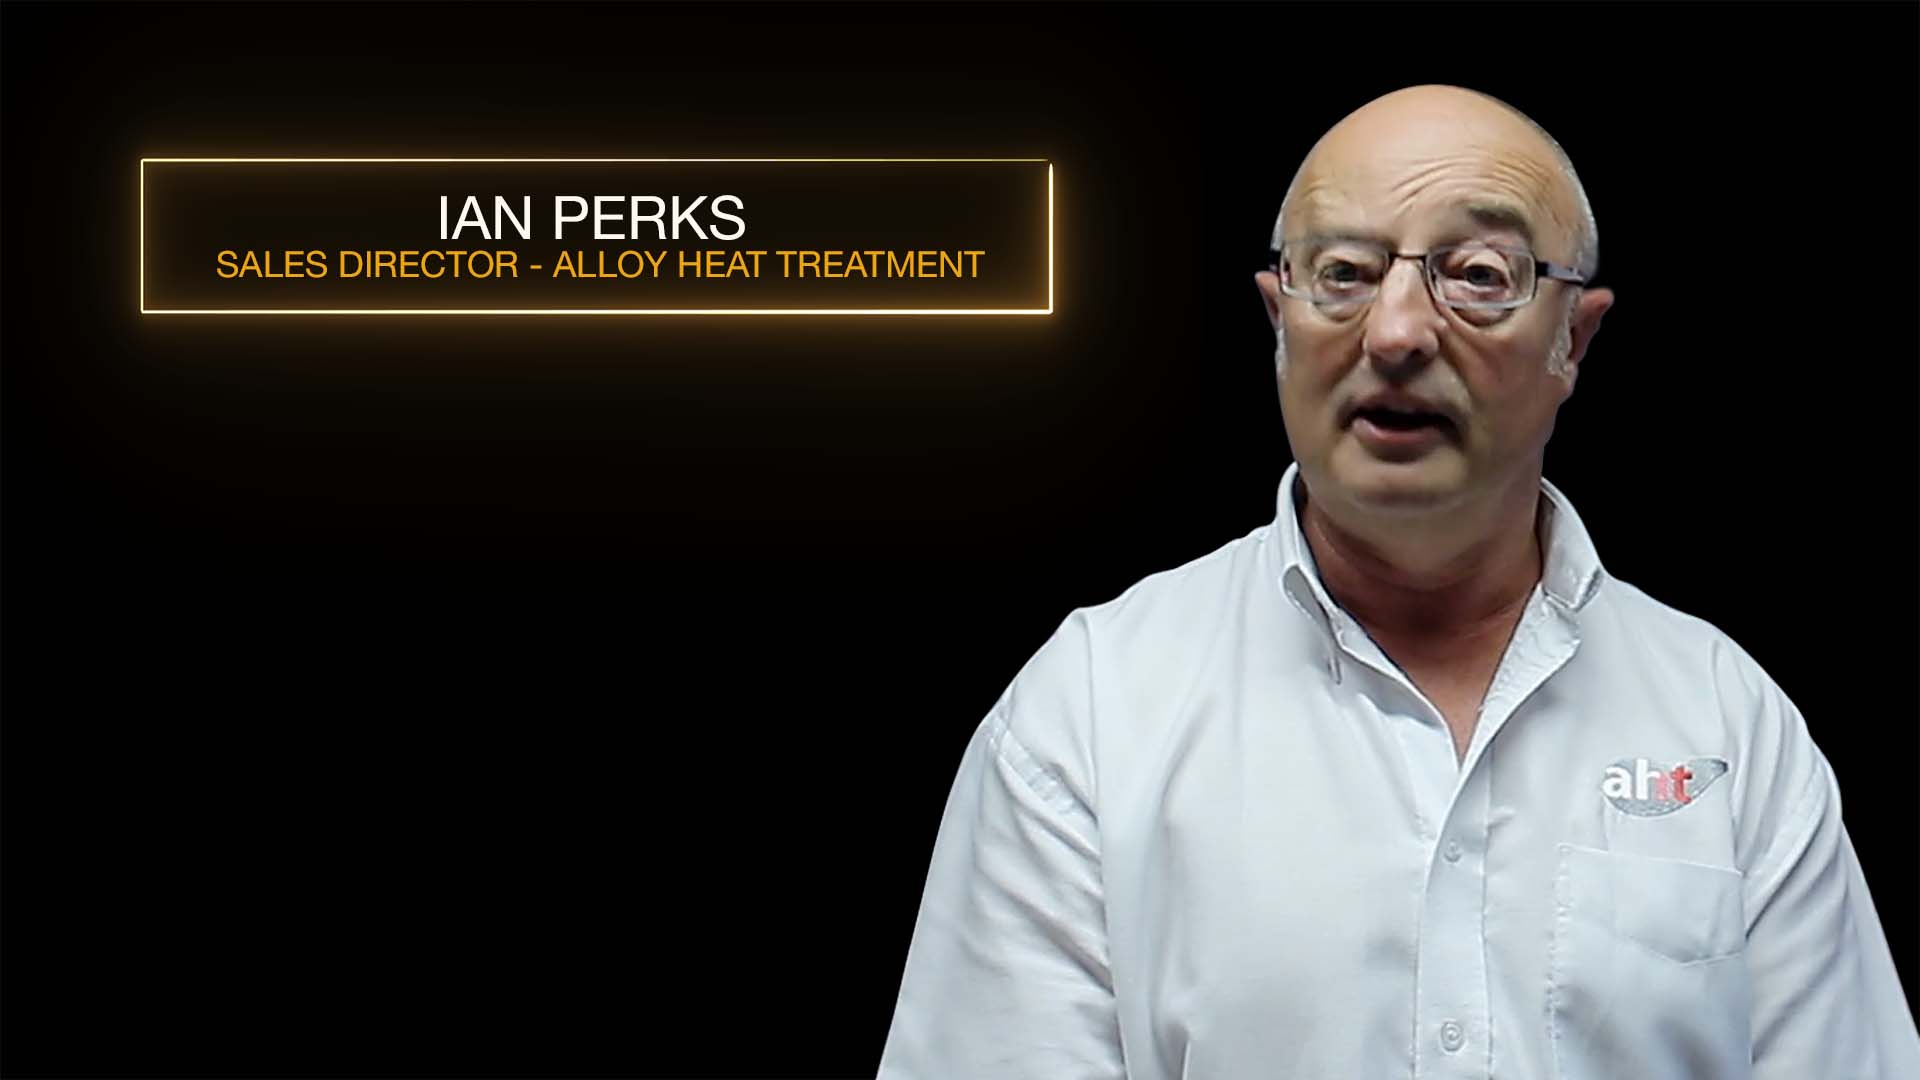 Ian Perks Testimonial